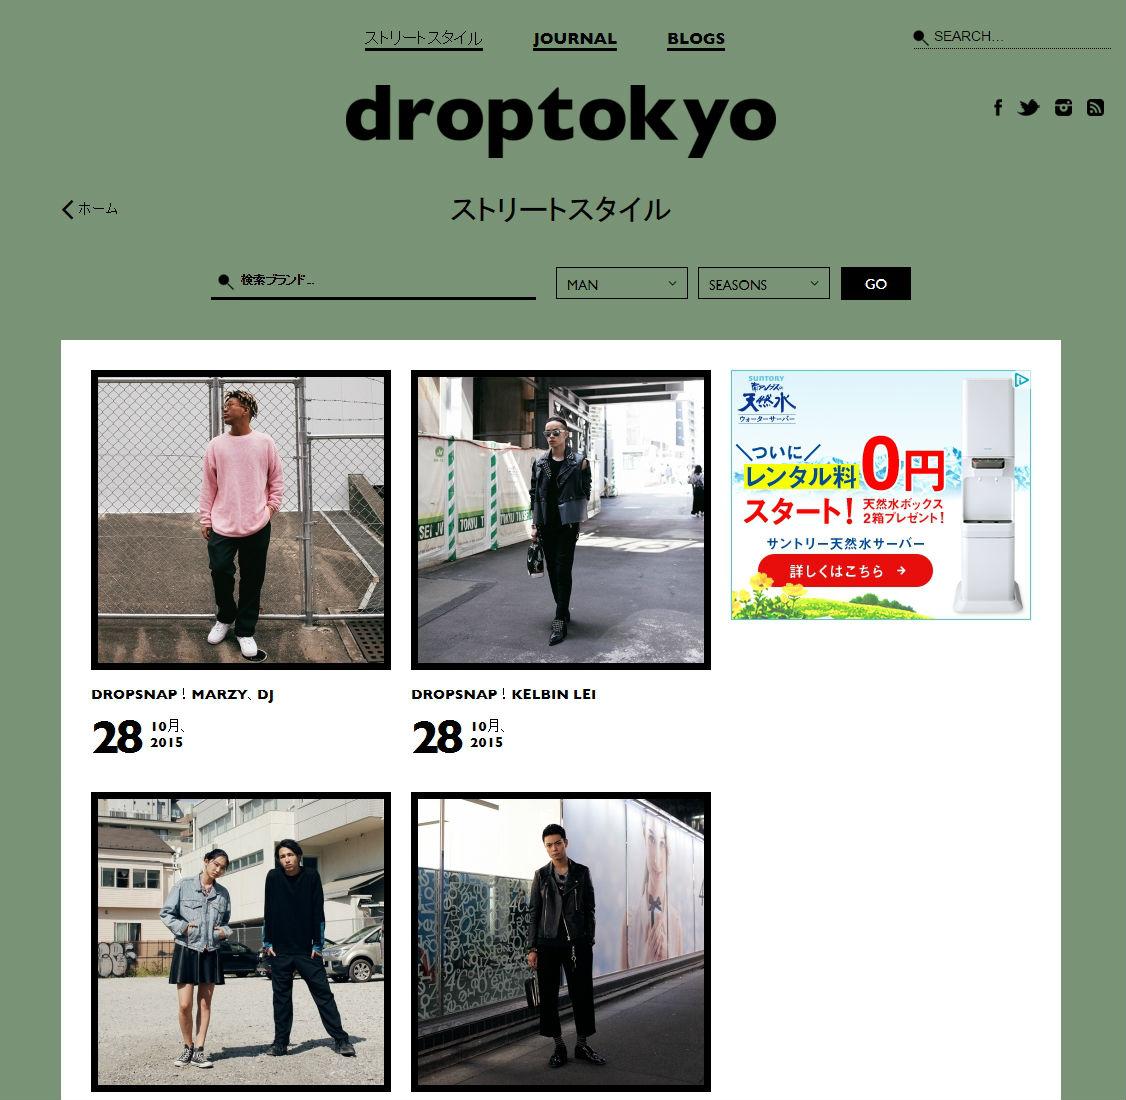 droptokyo(ドロップトウキョウ)